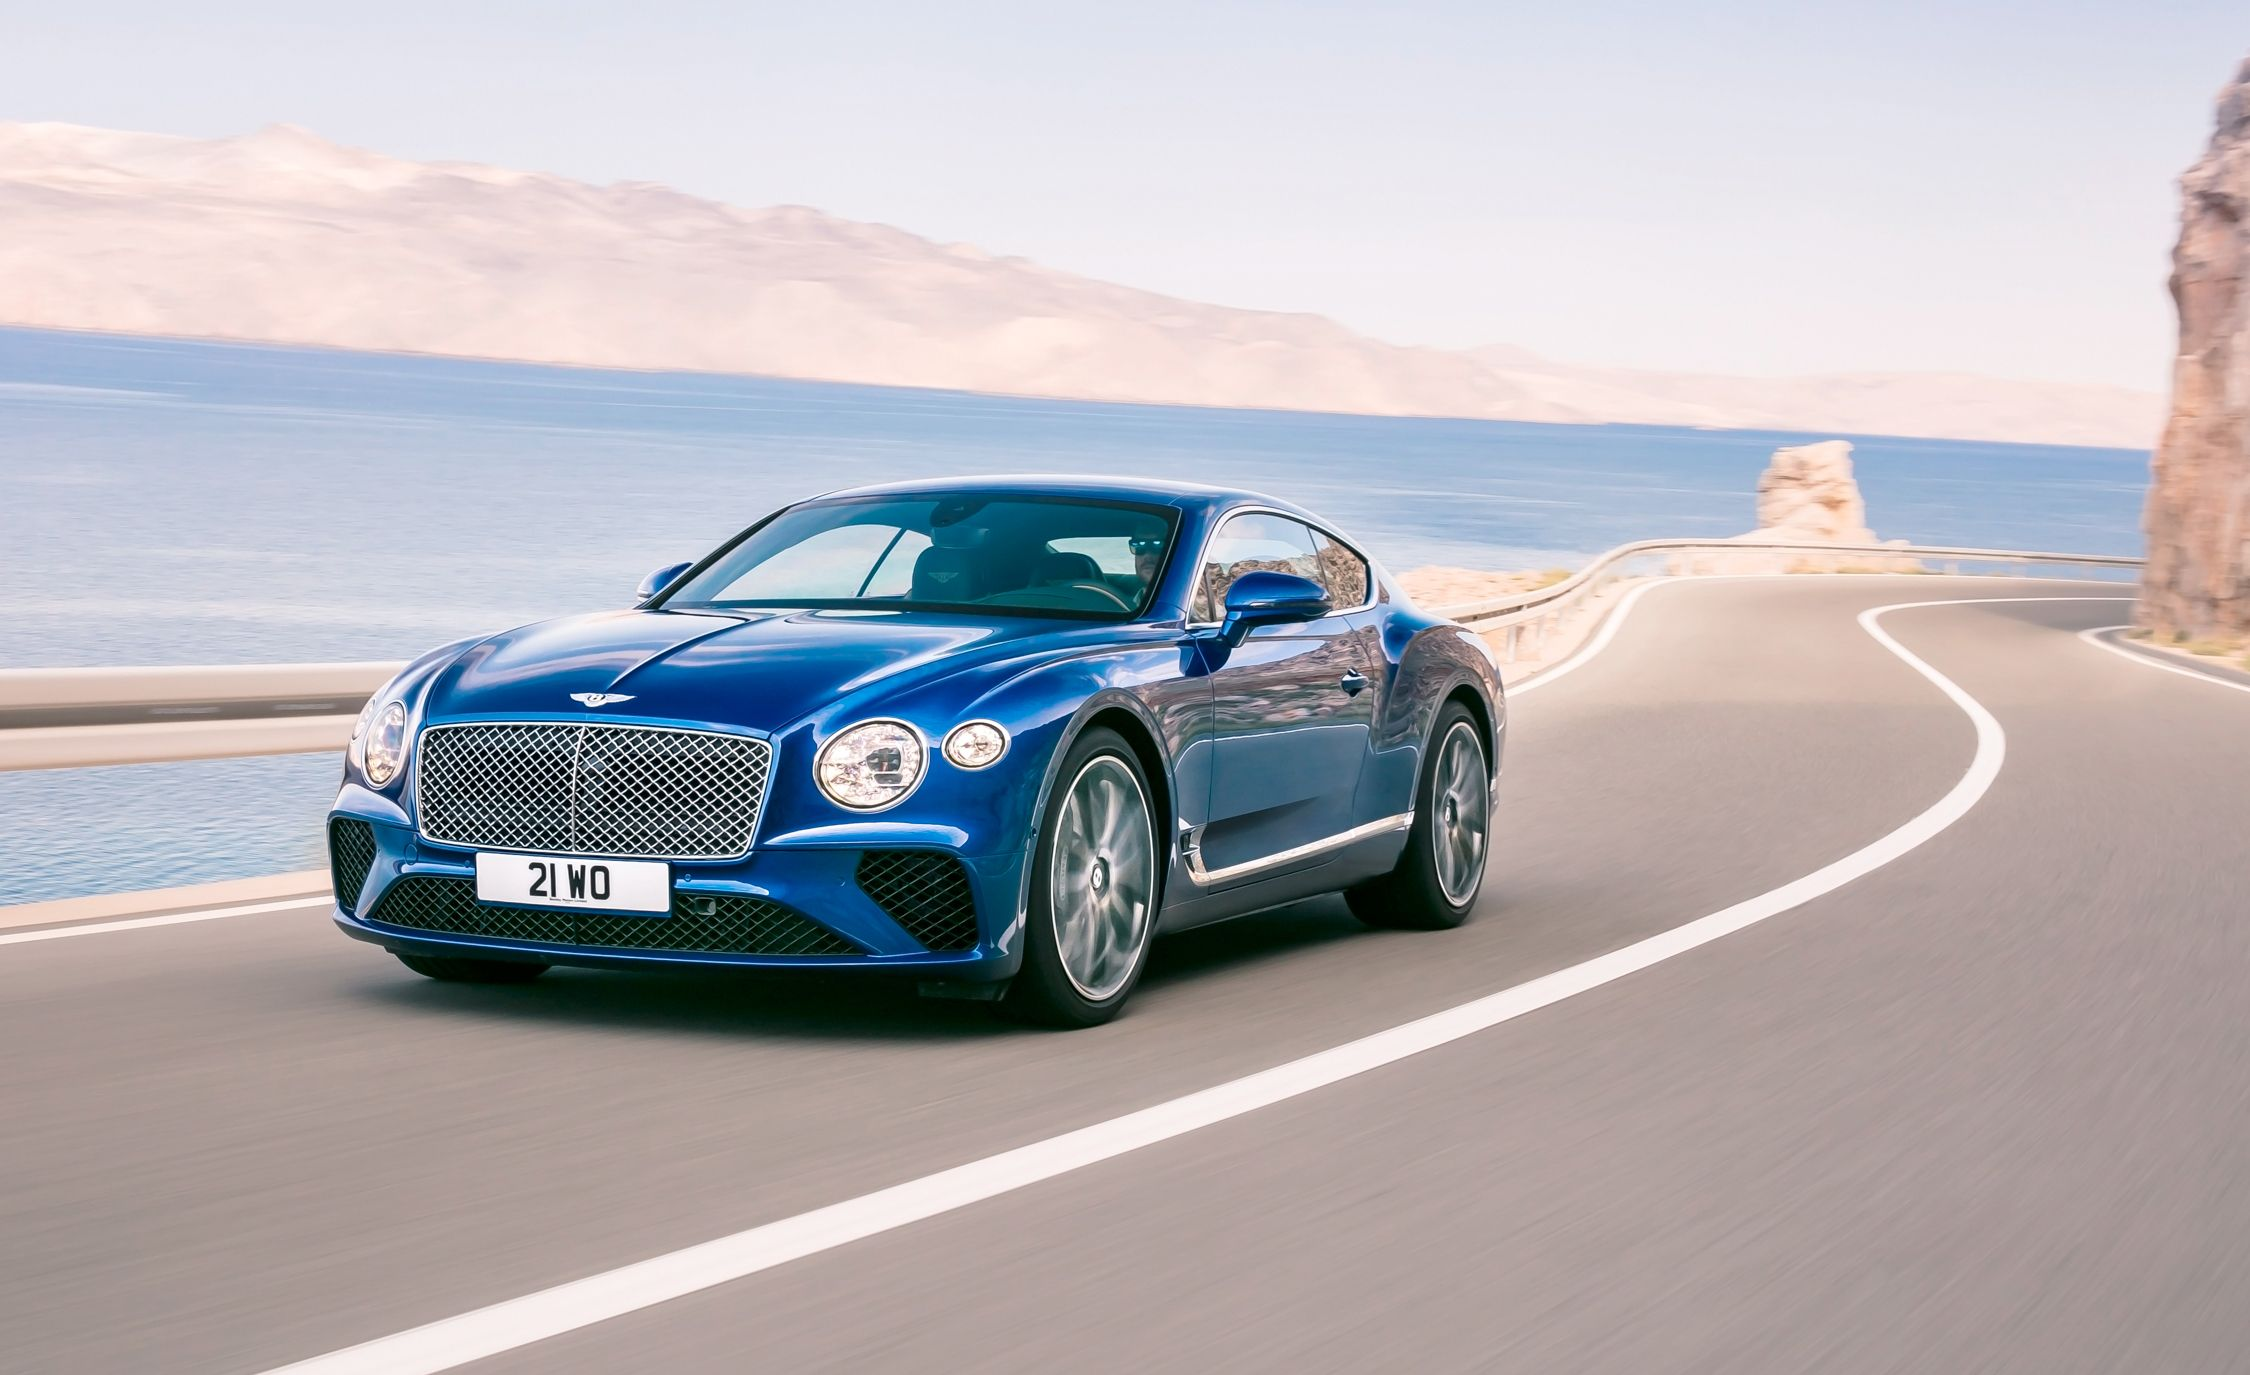 2019 Bentley Continental GT Photo Gallery